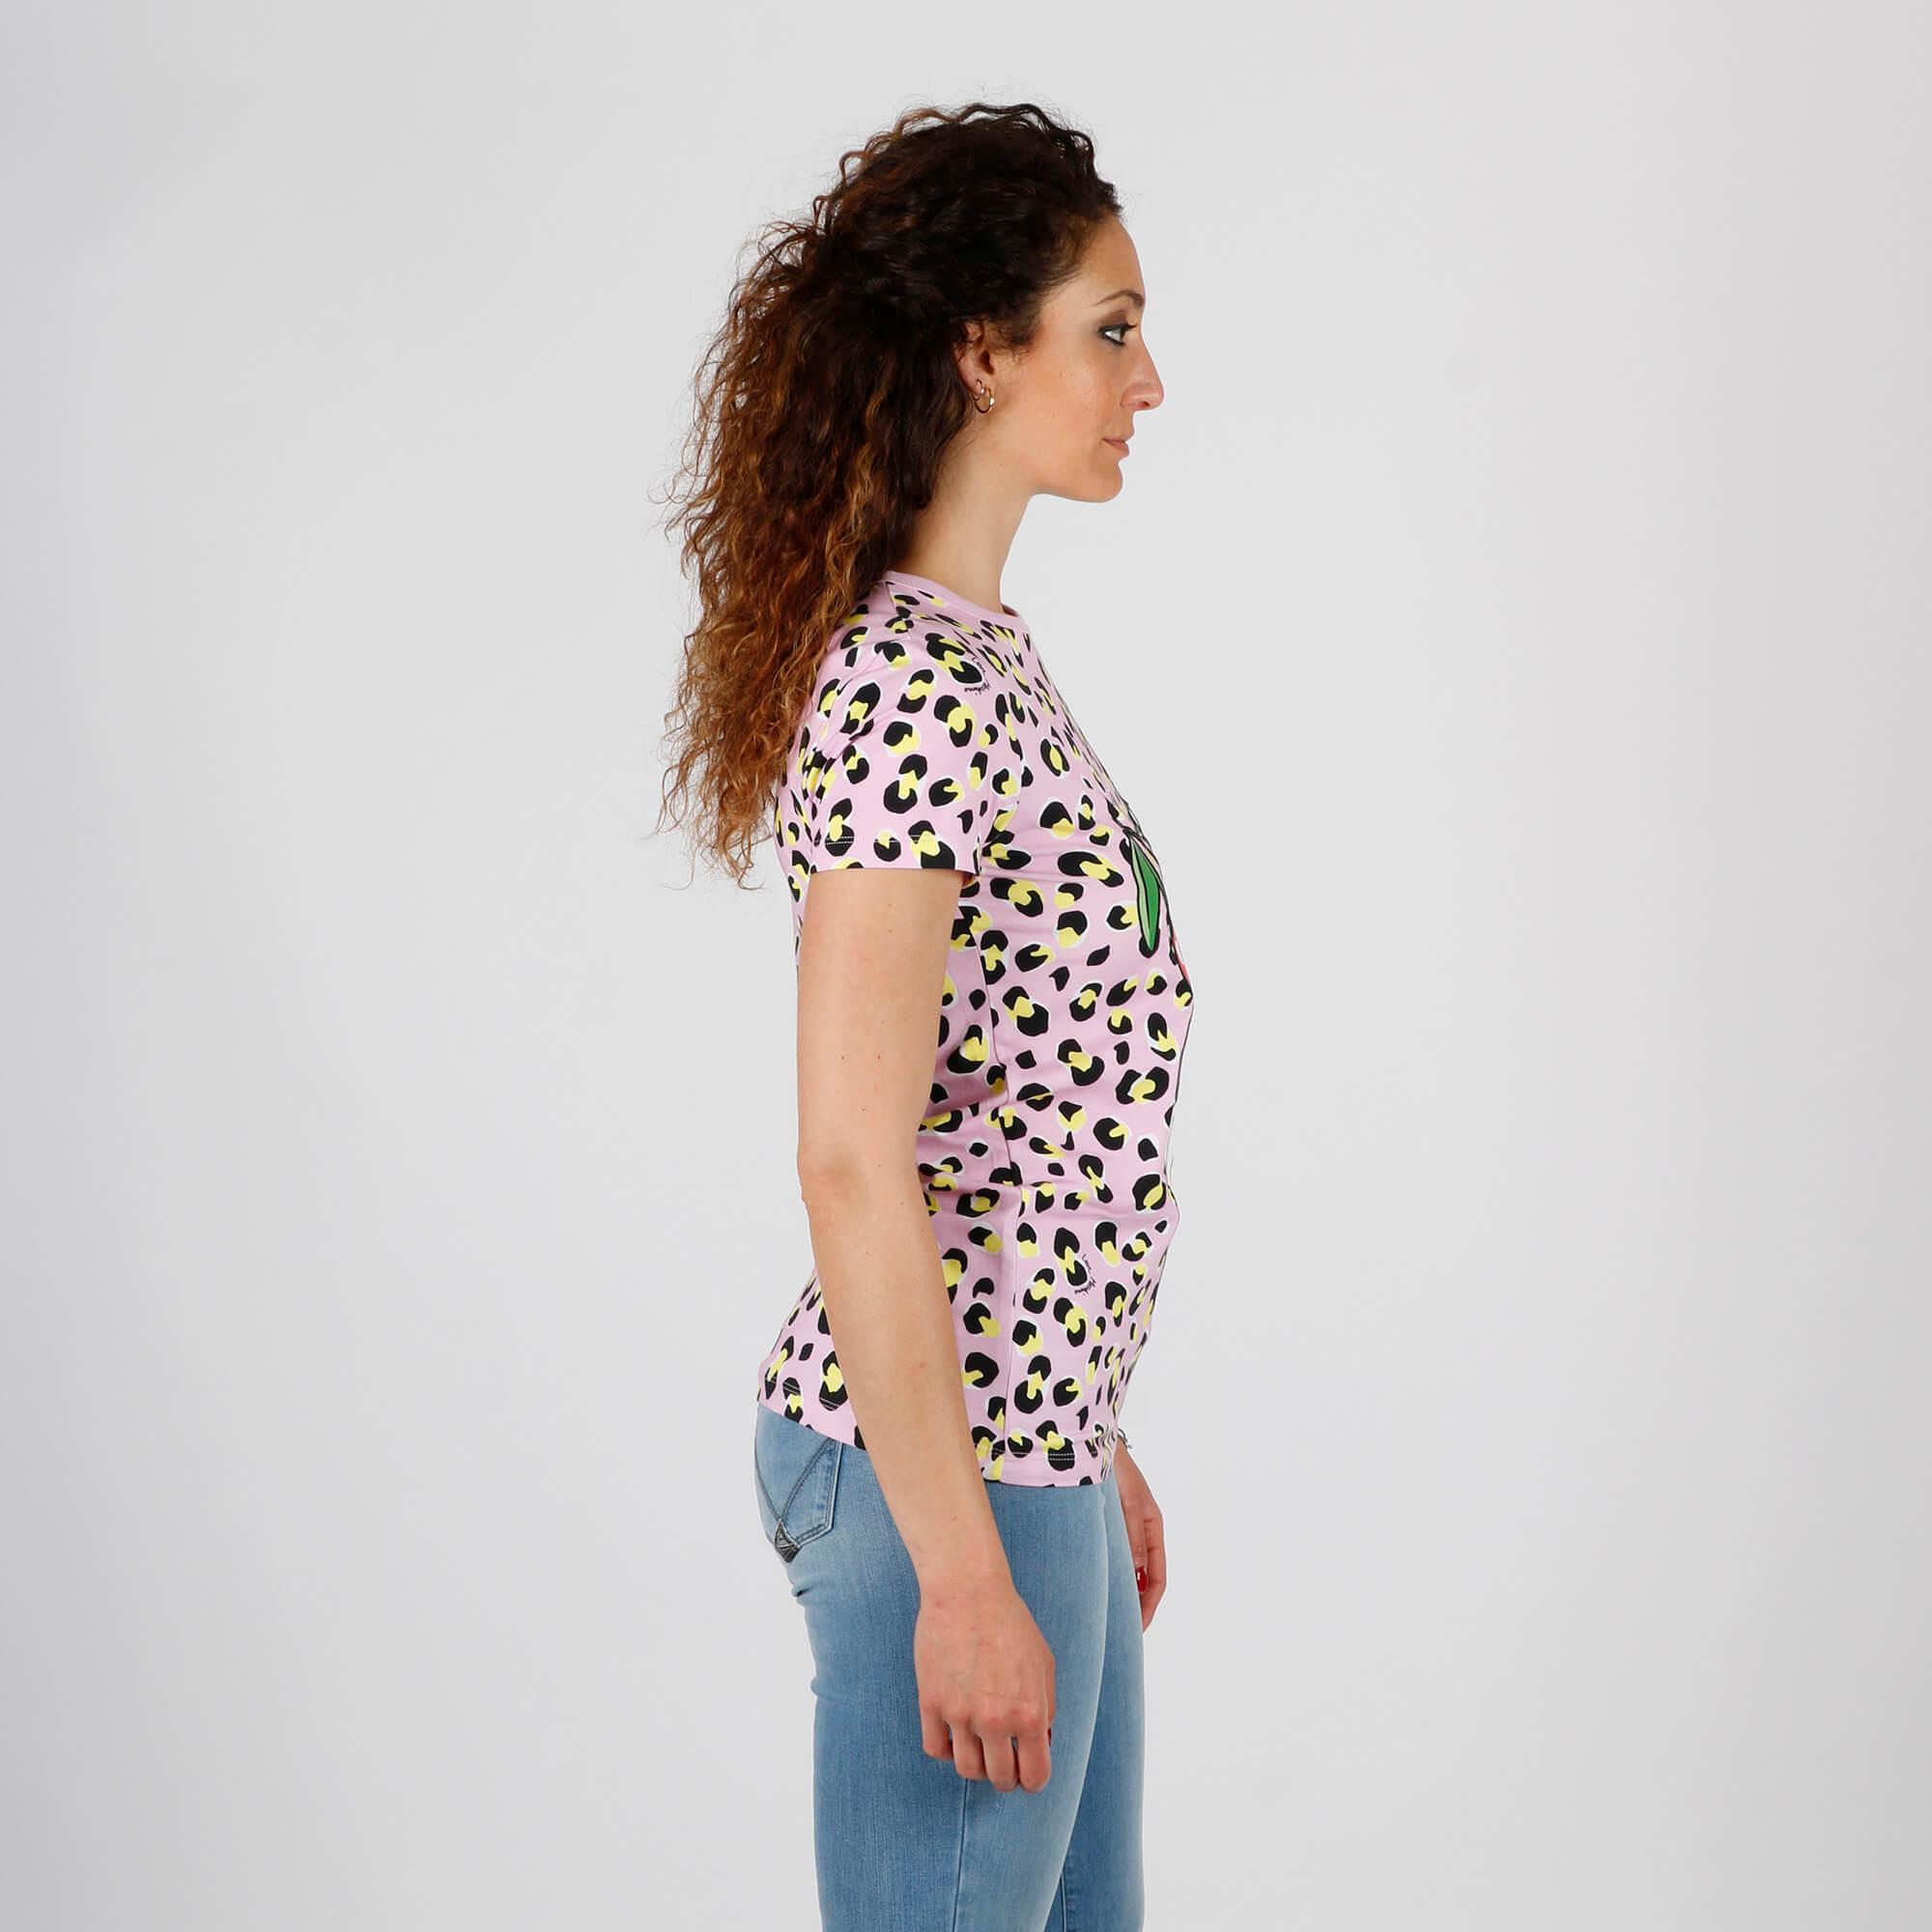 T-shirt donnina panna - Rosa